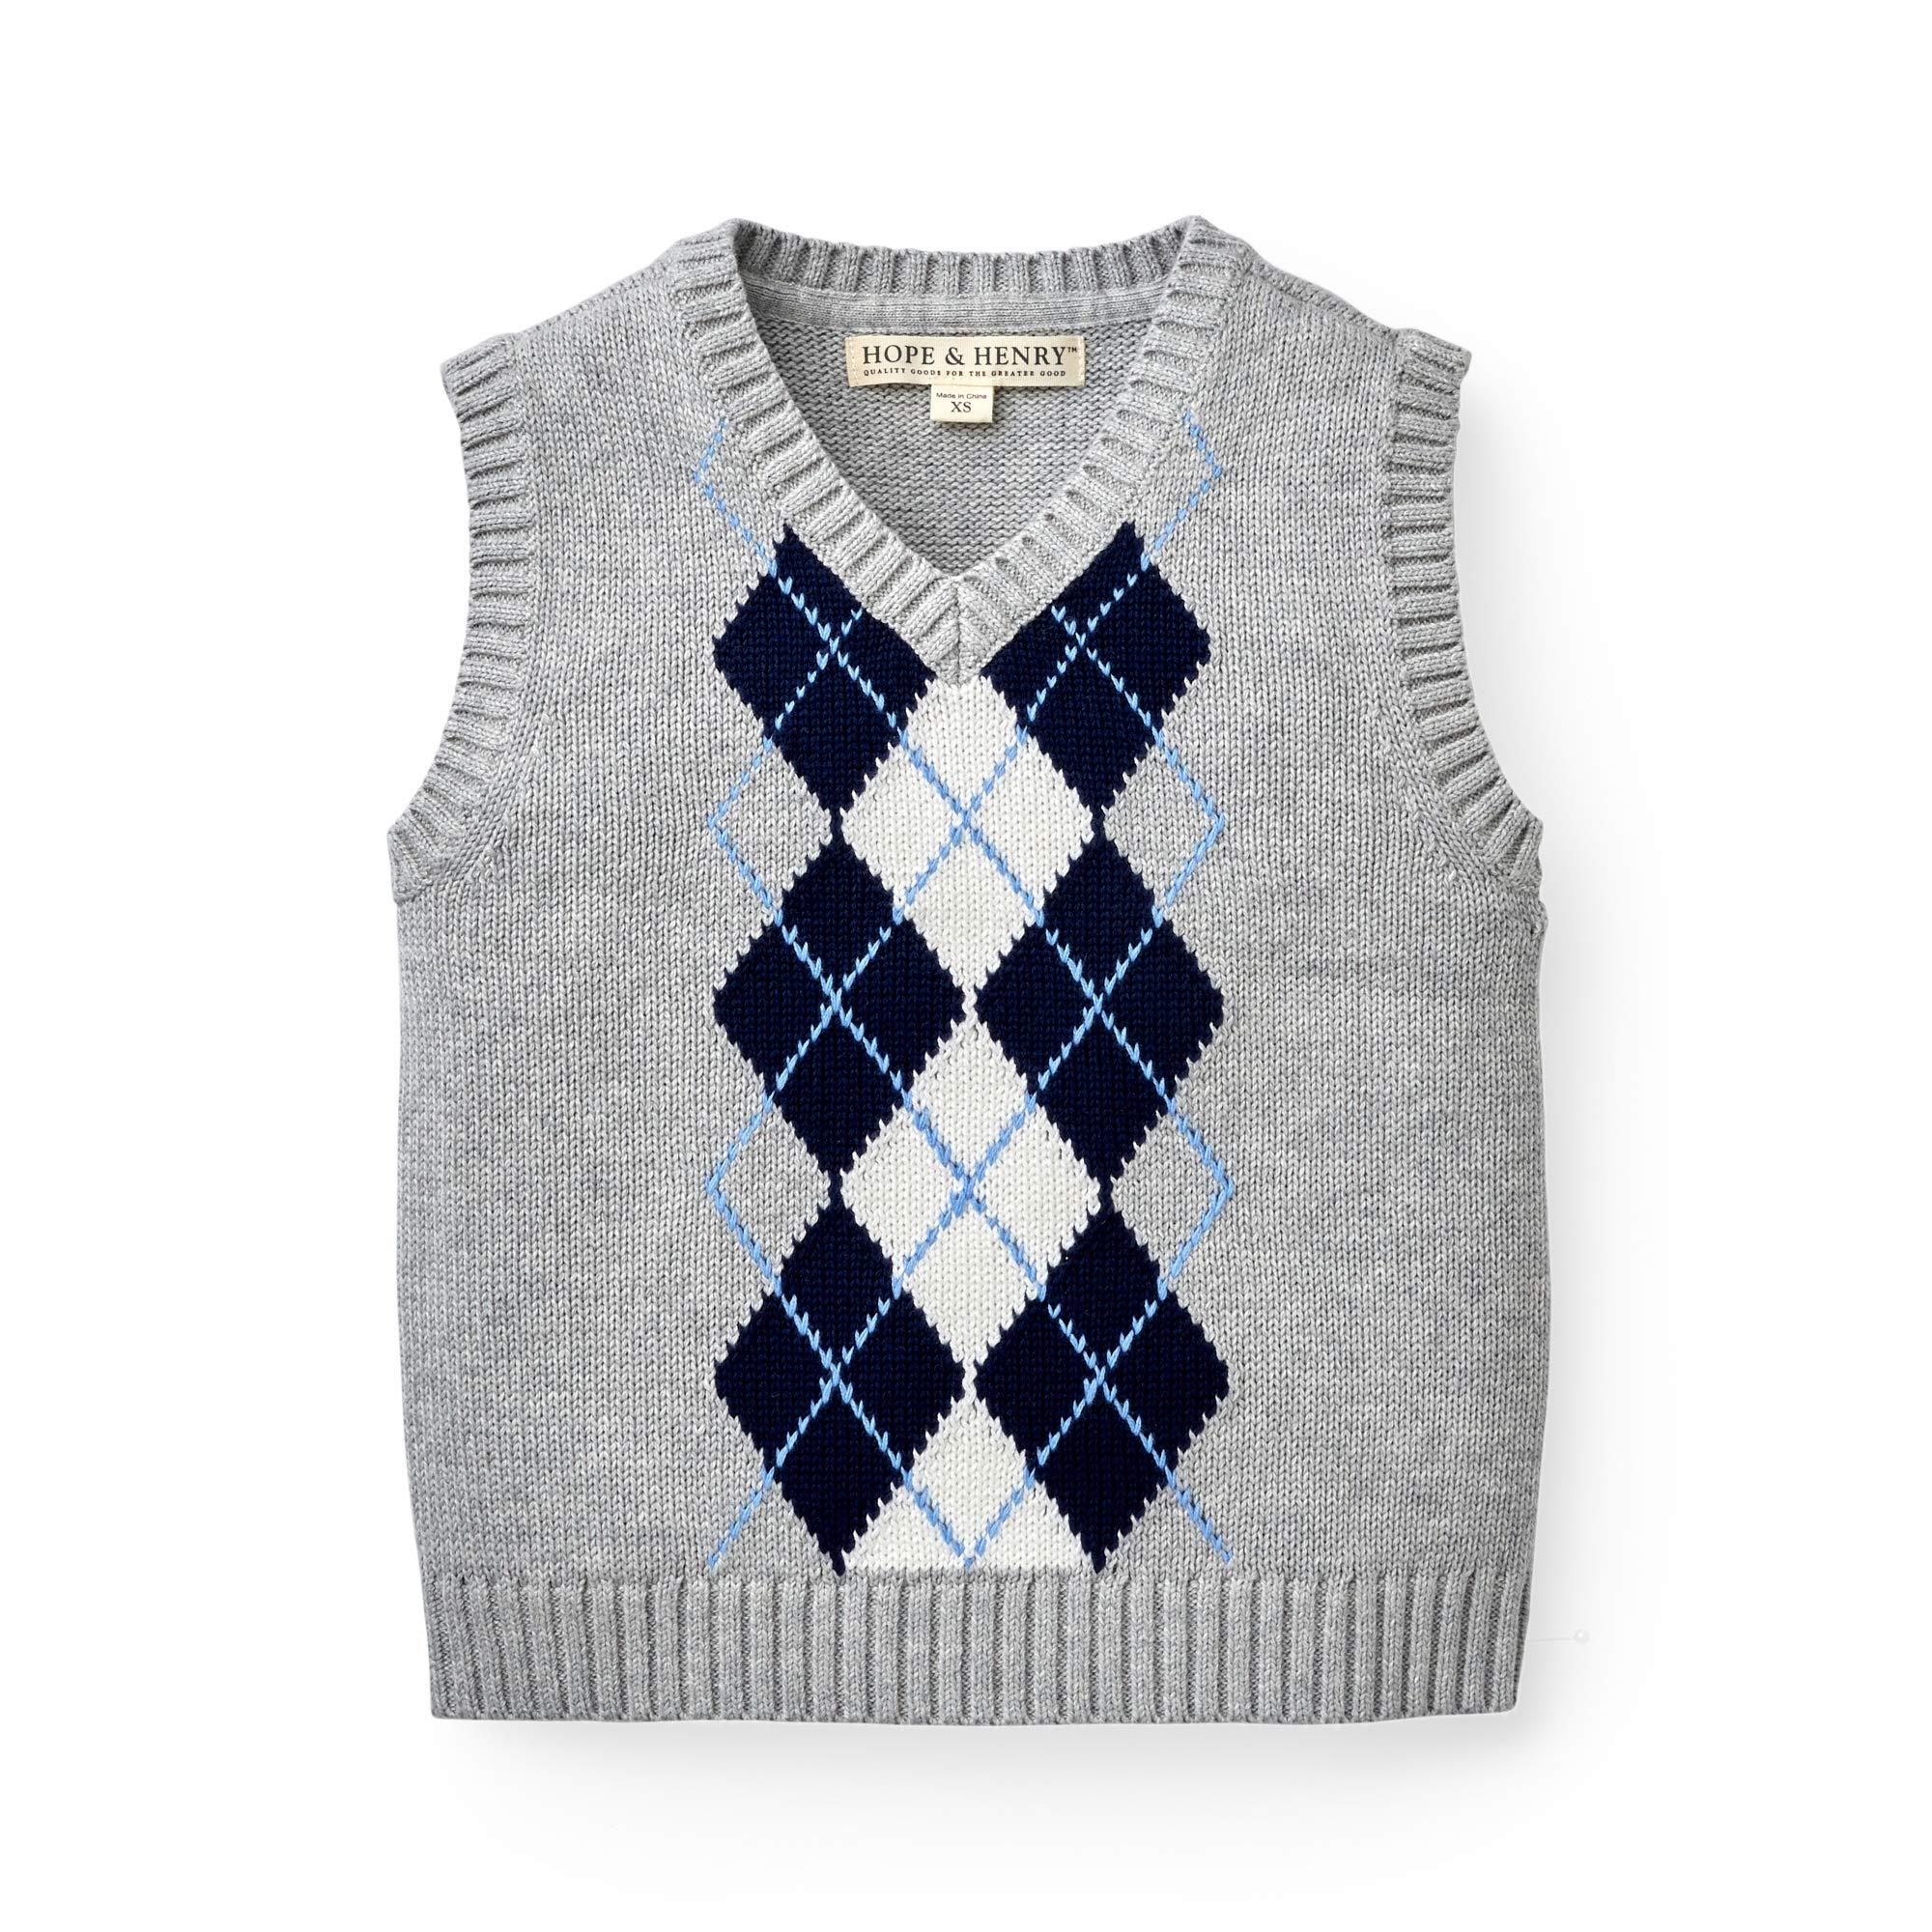 Hope & Henry Boys' Grey Argyle Cable Sweater Vest by Hope & Henry (Image #1)